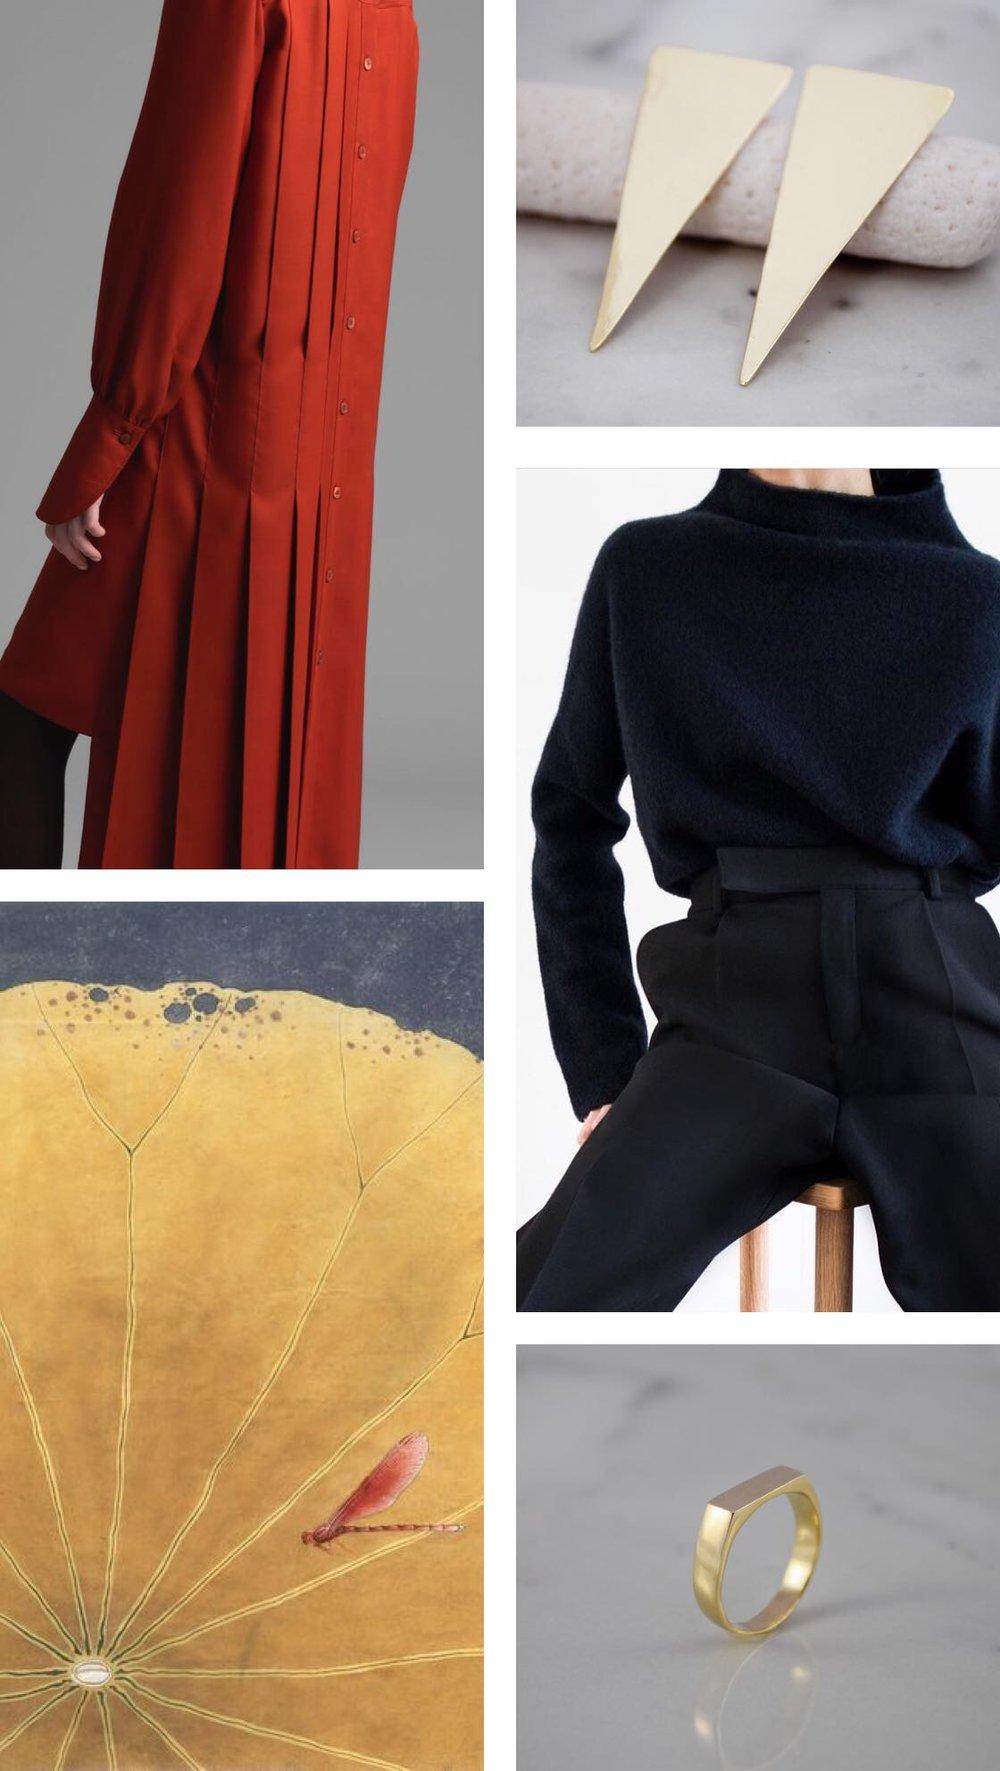 Chloé, Asymmetrical shirt silk shirt dress  |   Tria Earrings, 14K  |Filippa K, Yak funnelneck navy and trousers  |  Chinese painting  |   Flat Ring, 14K.